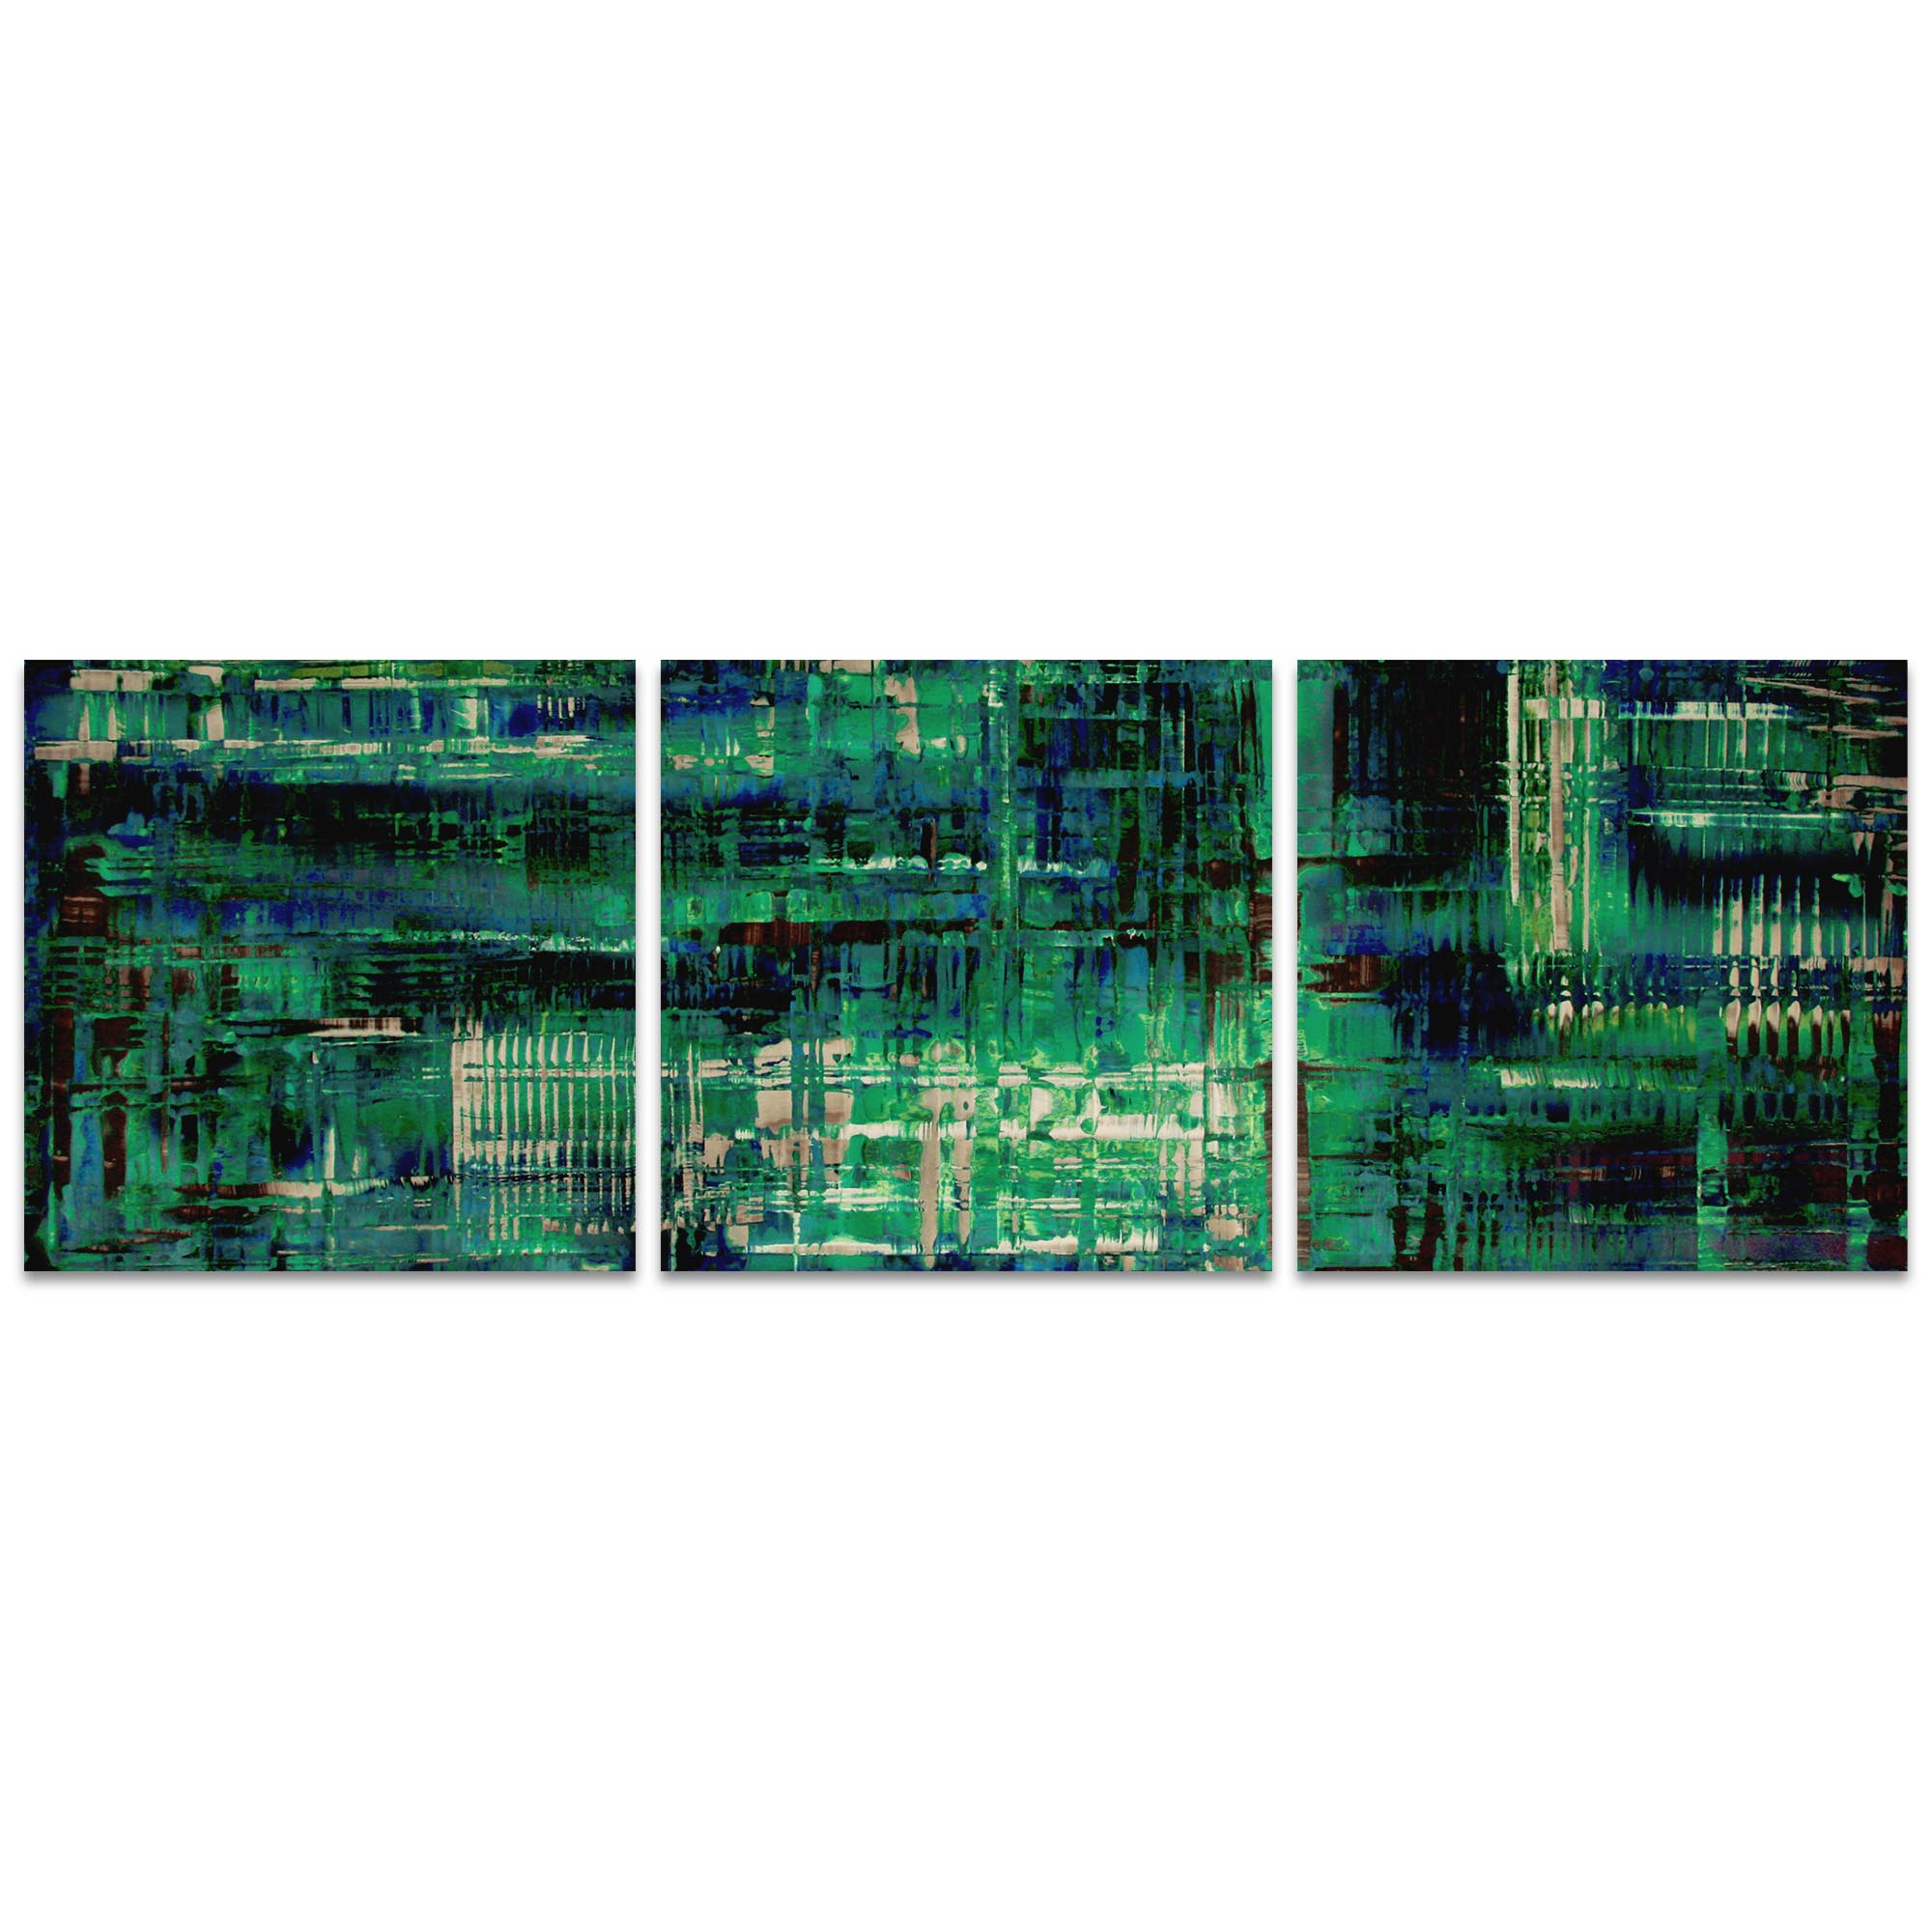 Aporia Blue Triptych 38x12in. Metal or Acrylic Contemporary Decor